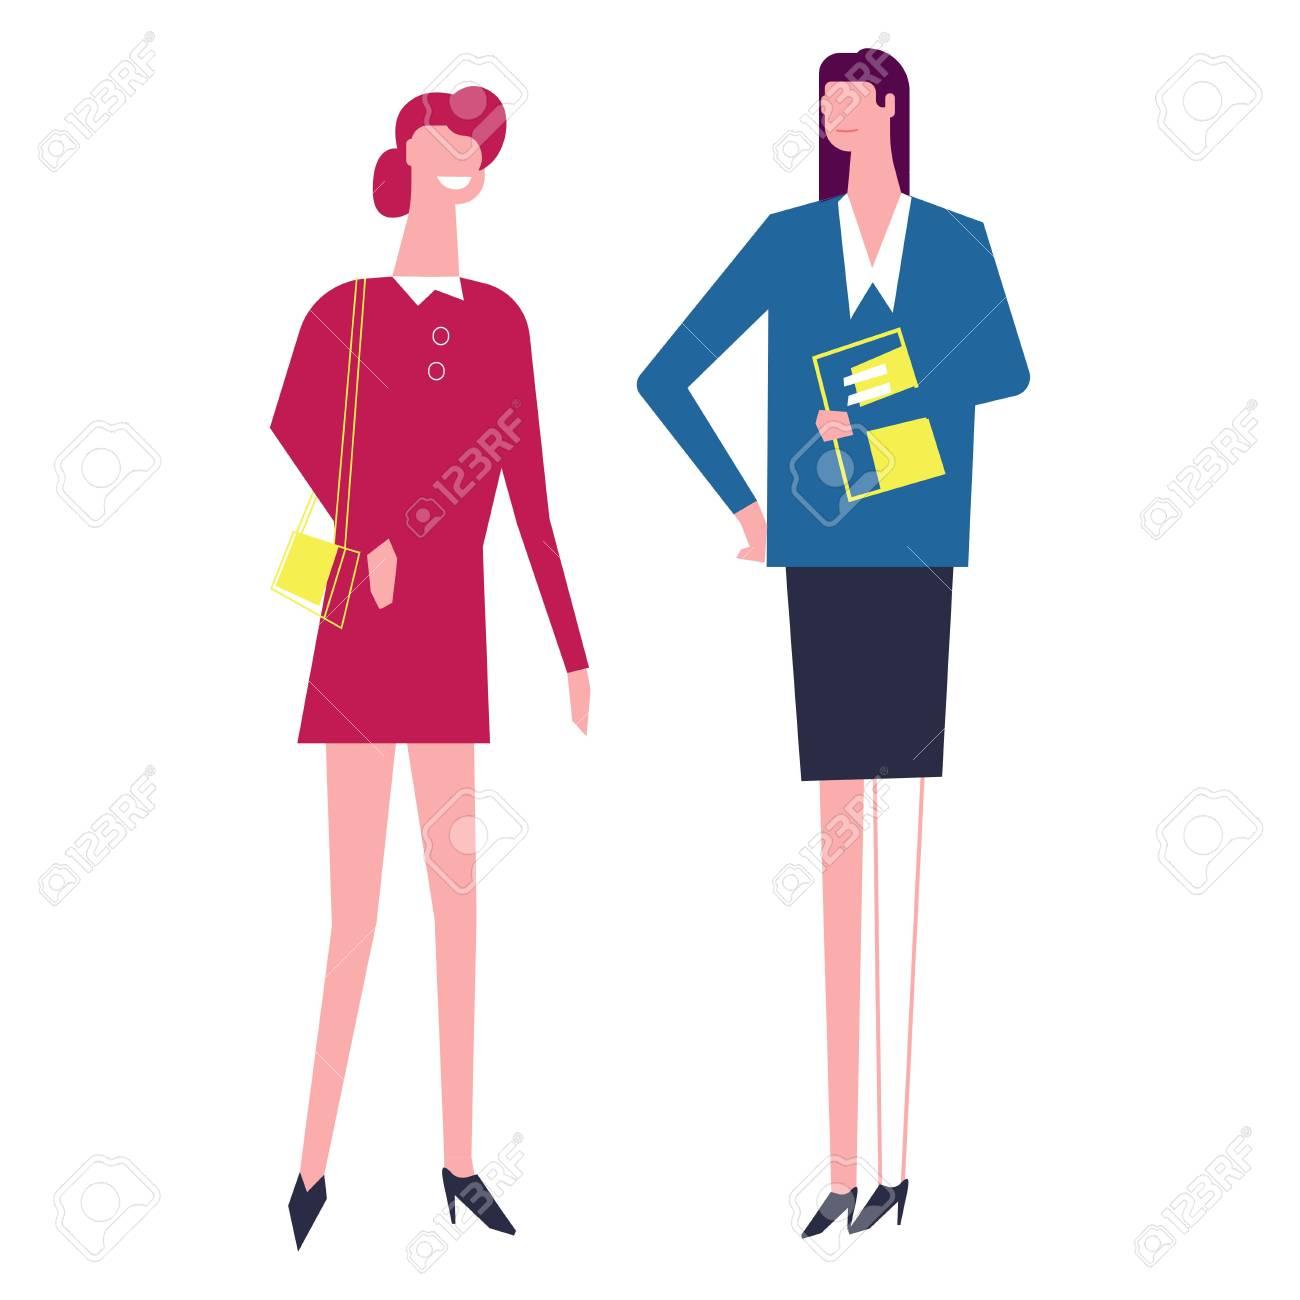 Talking Girls Stock Illustrations – 2,047 Talking Girls Stock  Illustrations, Vectors & Clipart - Dreamstime